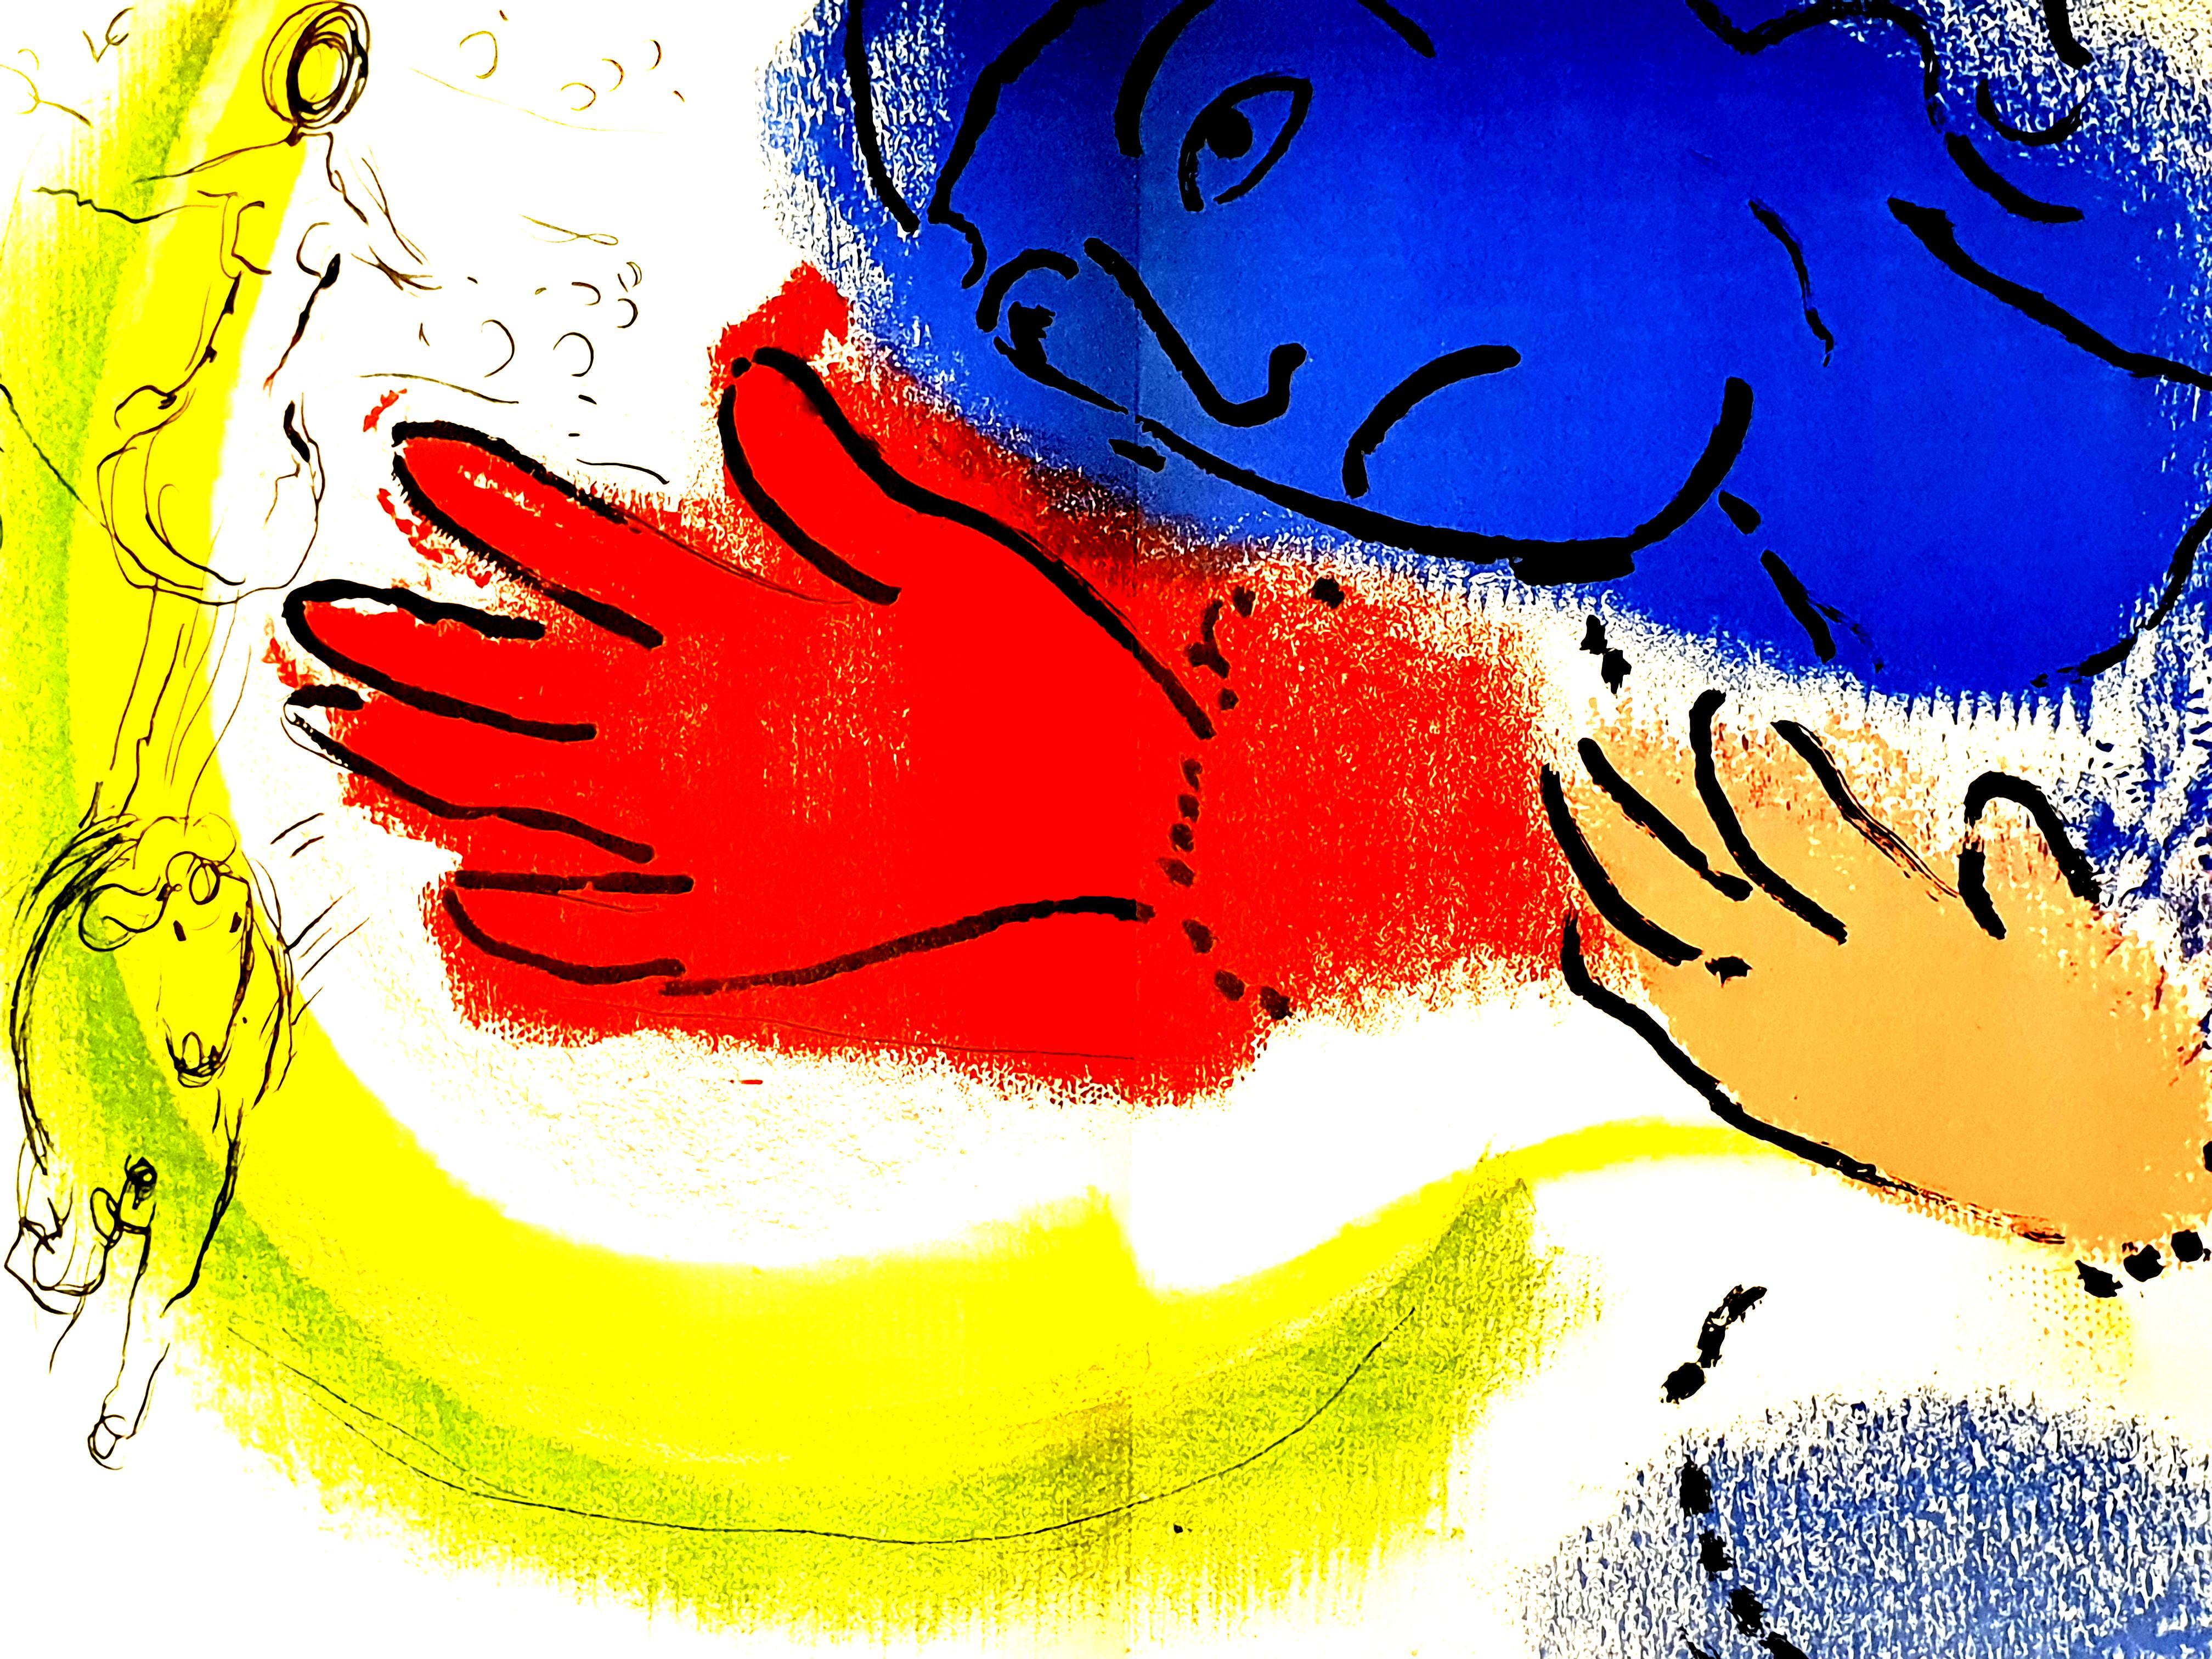 Marc Chagall - Horsewoman - Original Lithograph